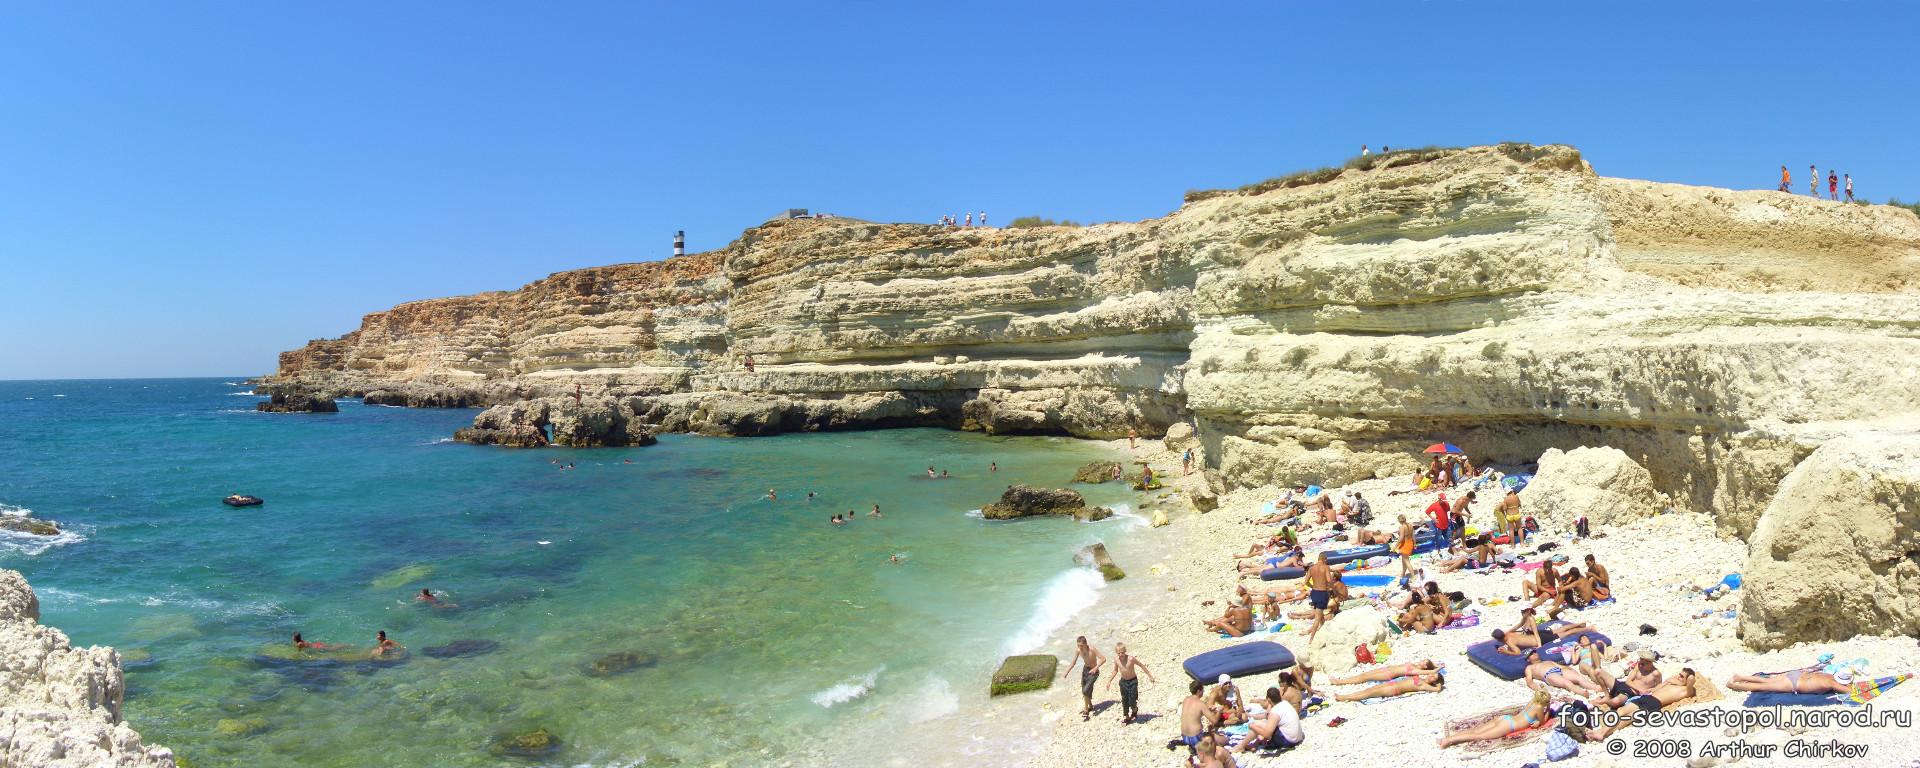 Пляжи в голубой бухте геленджик фото